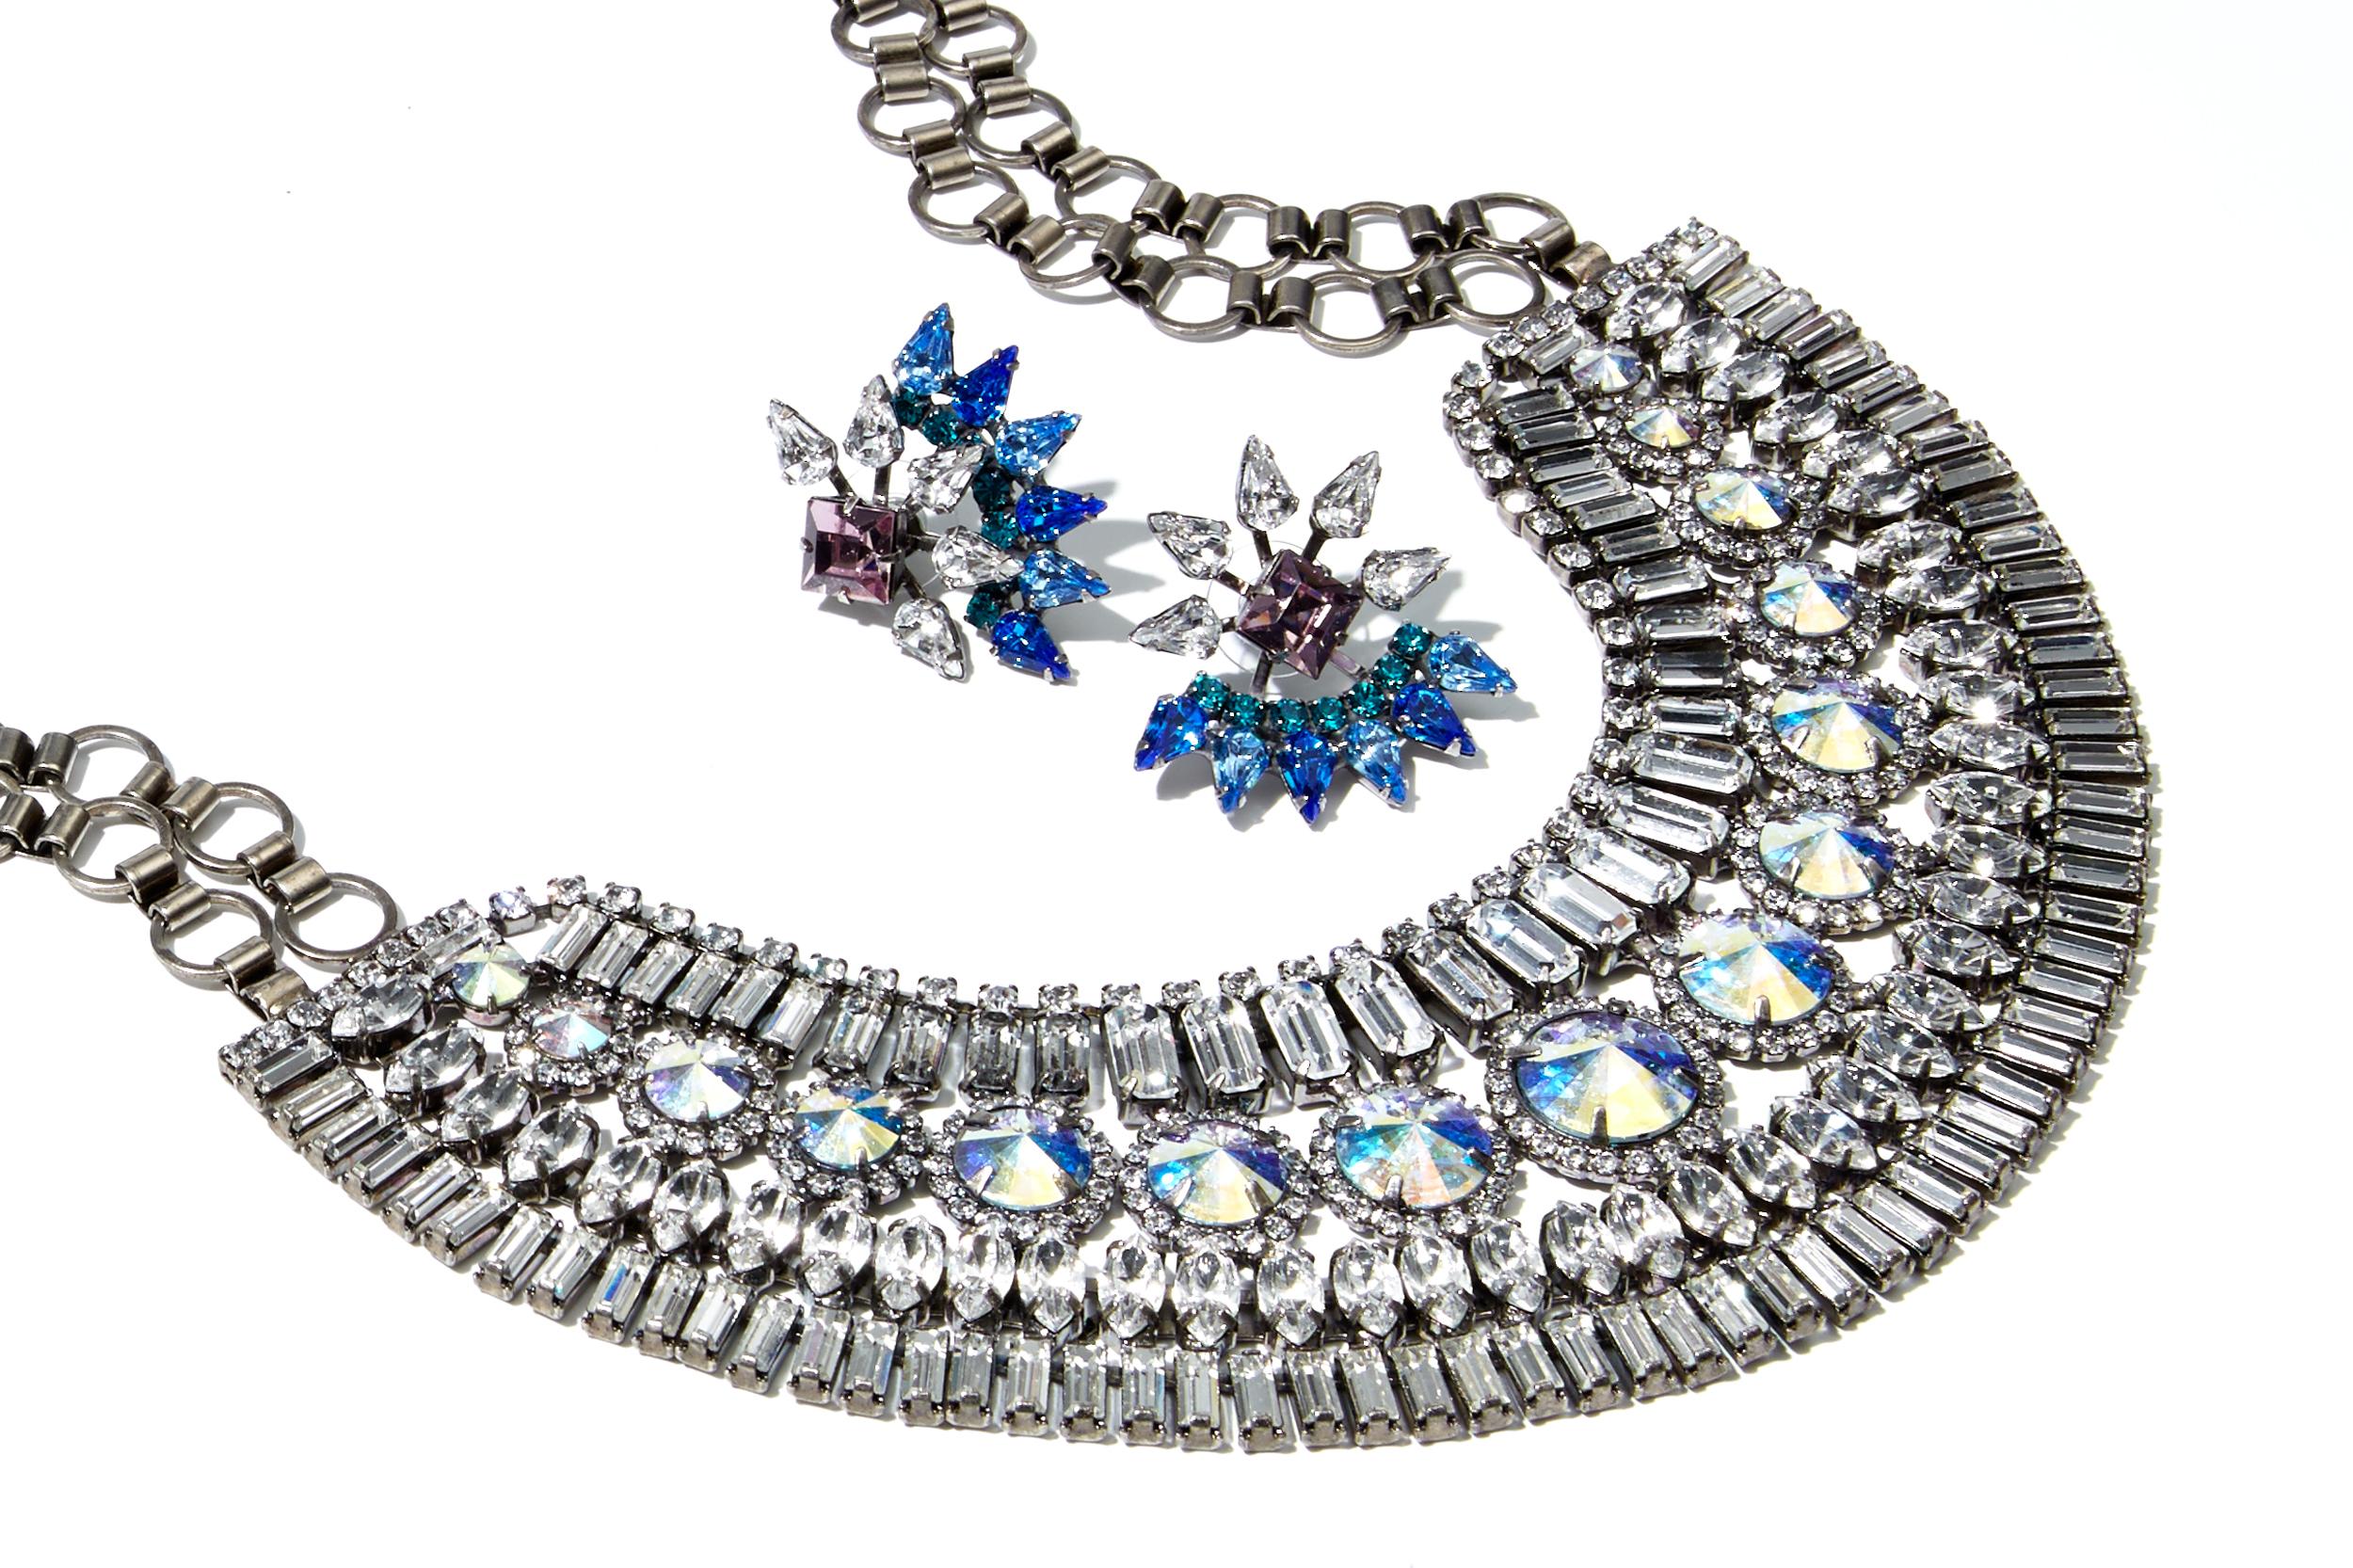 Dannijo_Jewelry_SUPERHERO_Fashion_Jewelry_1098254690_EDITORIAL_183.jpg